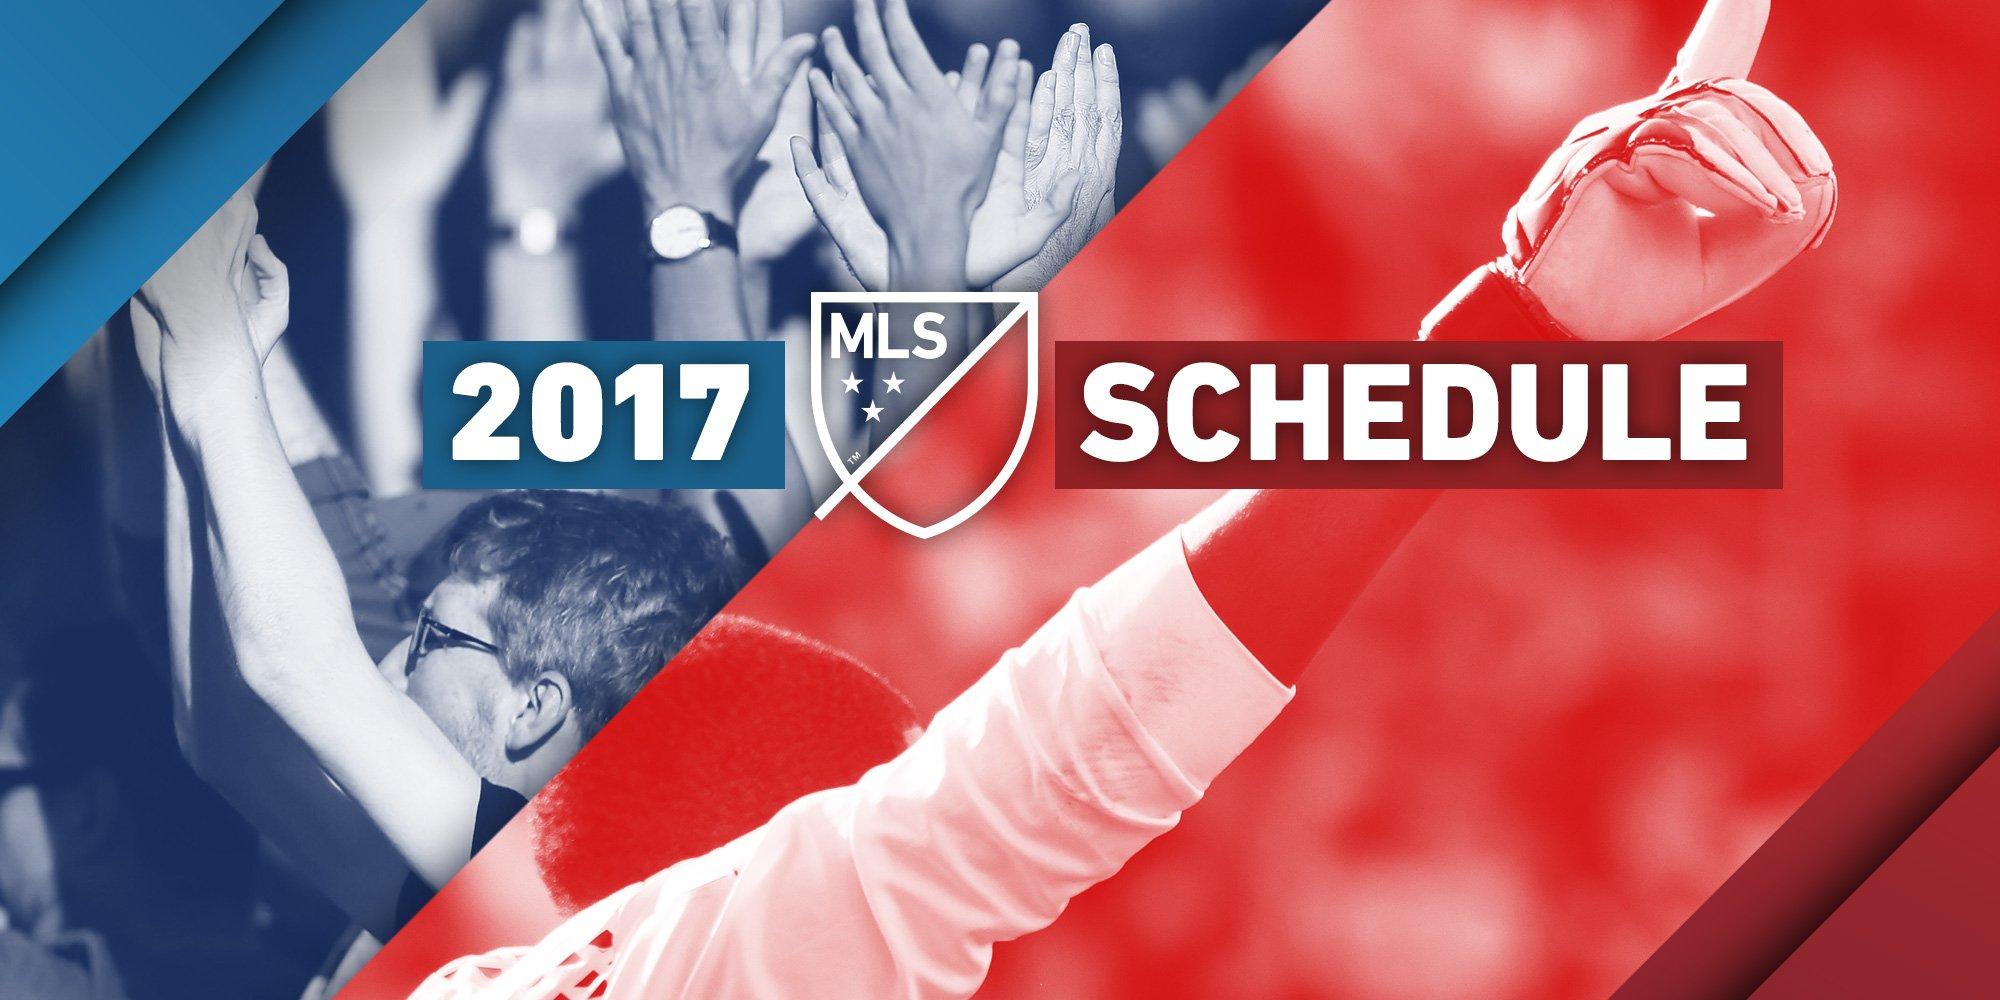 Mark your calendars.   📅 2017 MLS Schedule 📅: https://t.co/JbKjSijWhZ https://t.co/2VAvtpYuoM